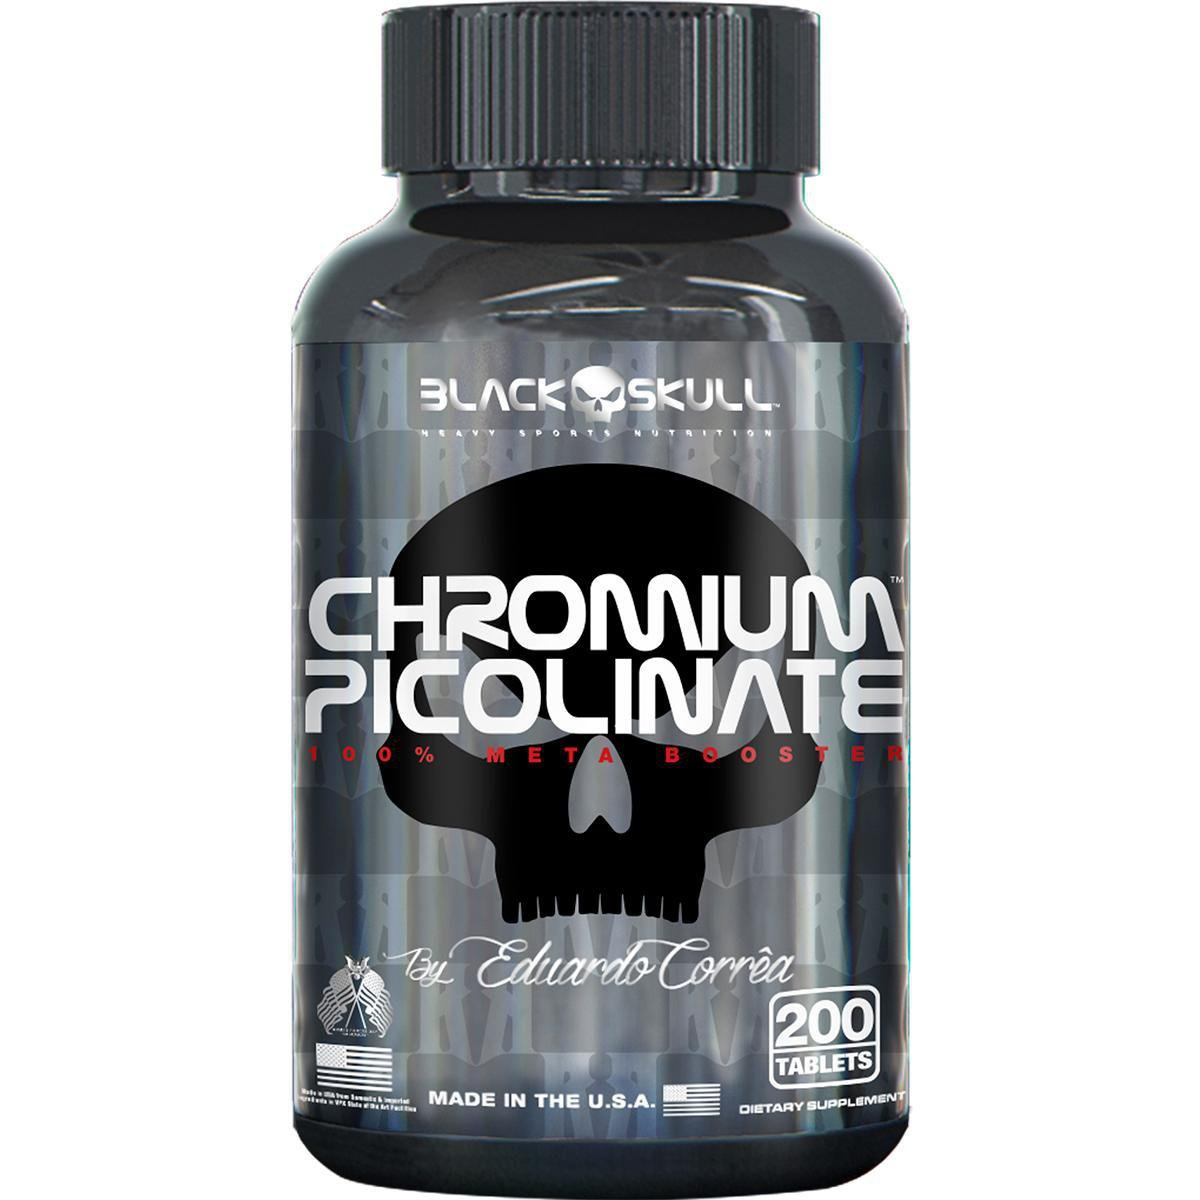 Chromium Picolinate 200 Tabs By Eduardo Corrêa - Black Skull